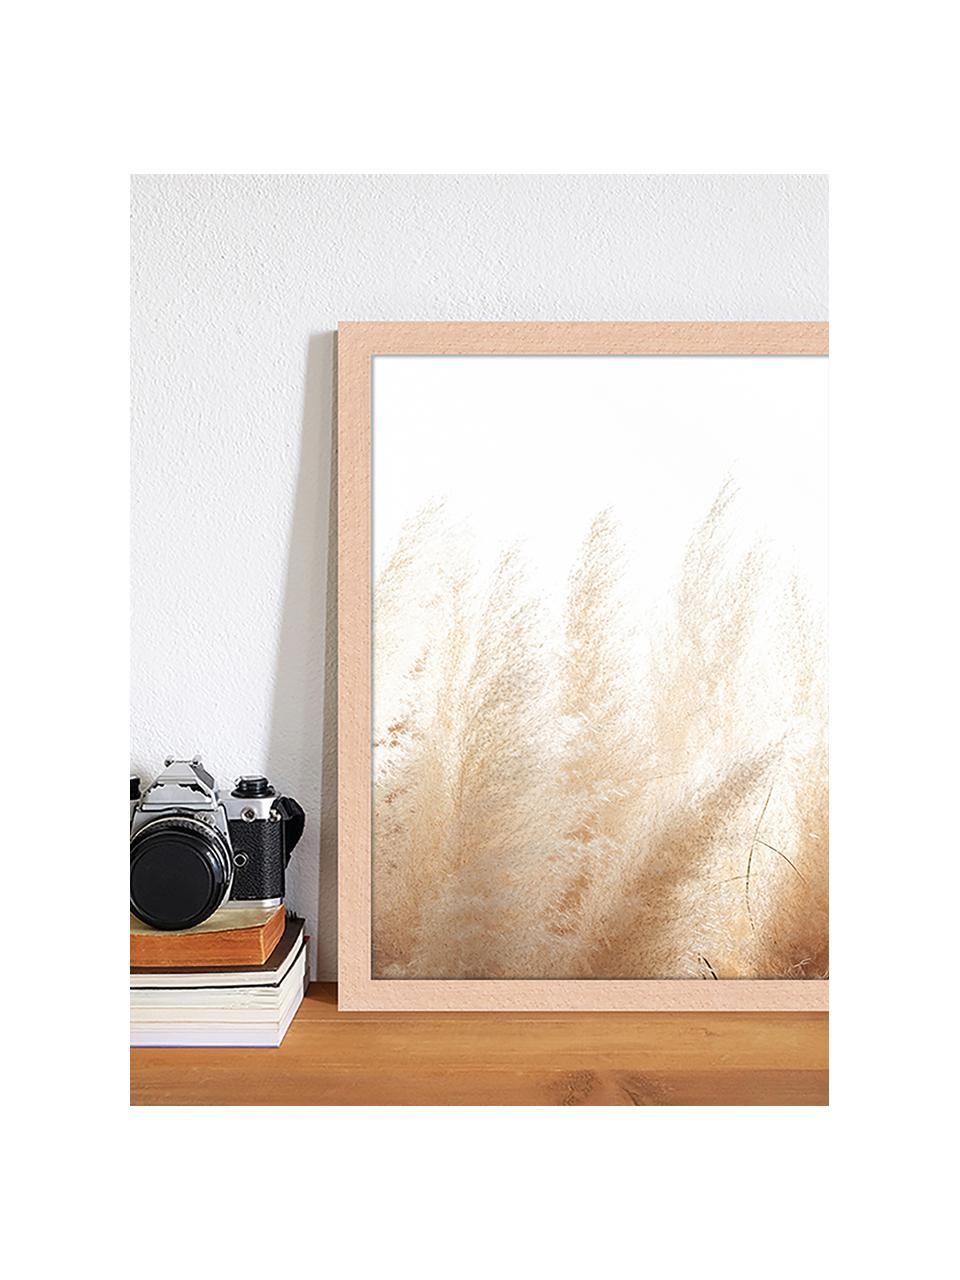 Ingelijste digitale print Pampa Grass, Afbeelding: digitale print op papier,, Lijst: gelakt hout, Multicolour, 33 x 43 cm